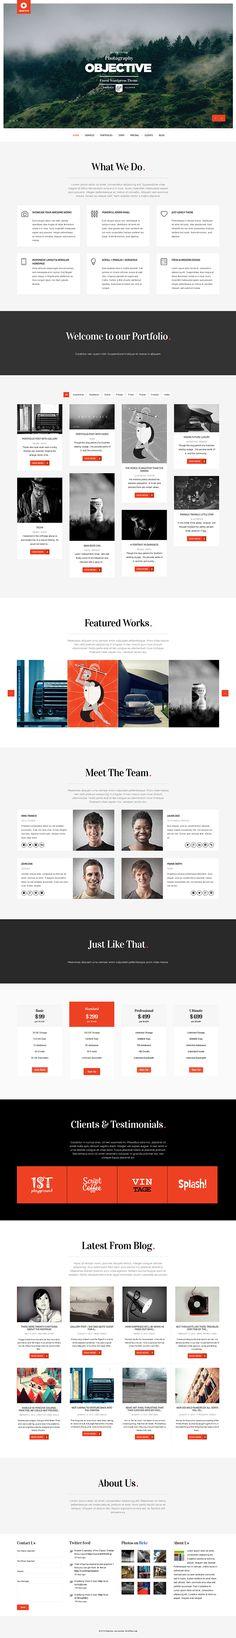 Objective - Responsive Portfolio Photography Theme - http://capethemes.com/demo/objective/